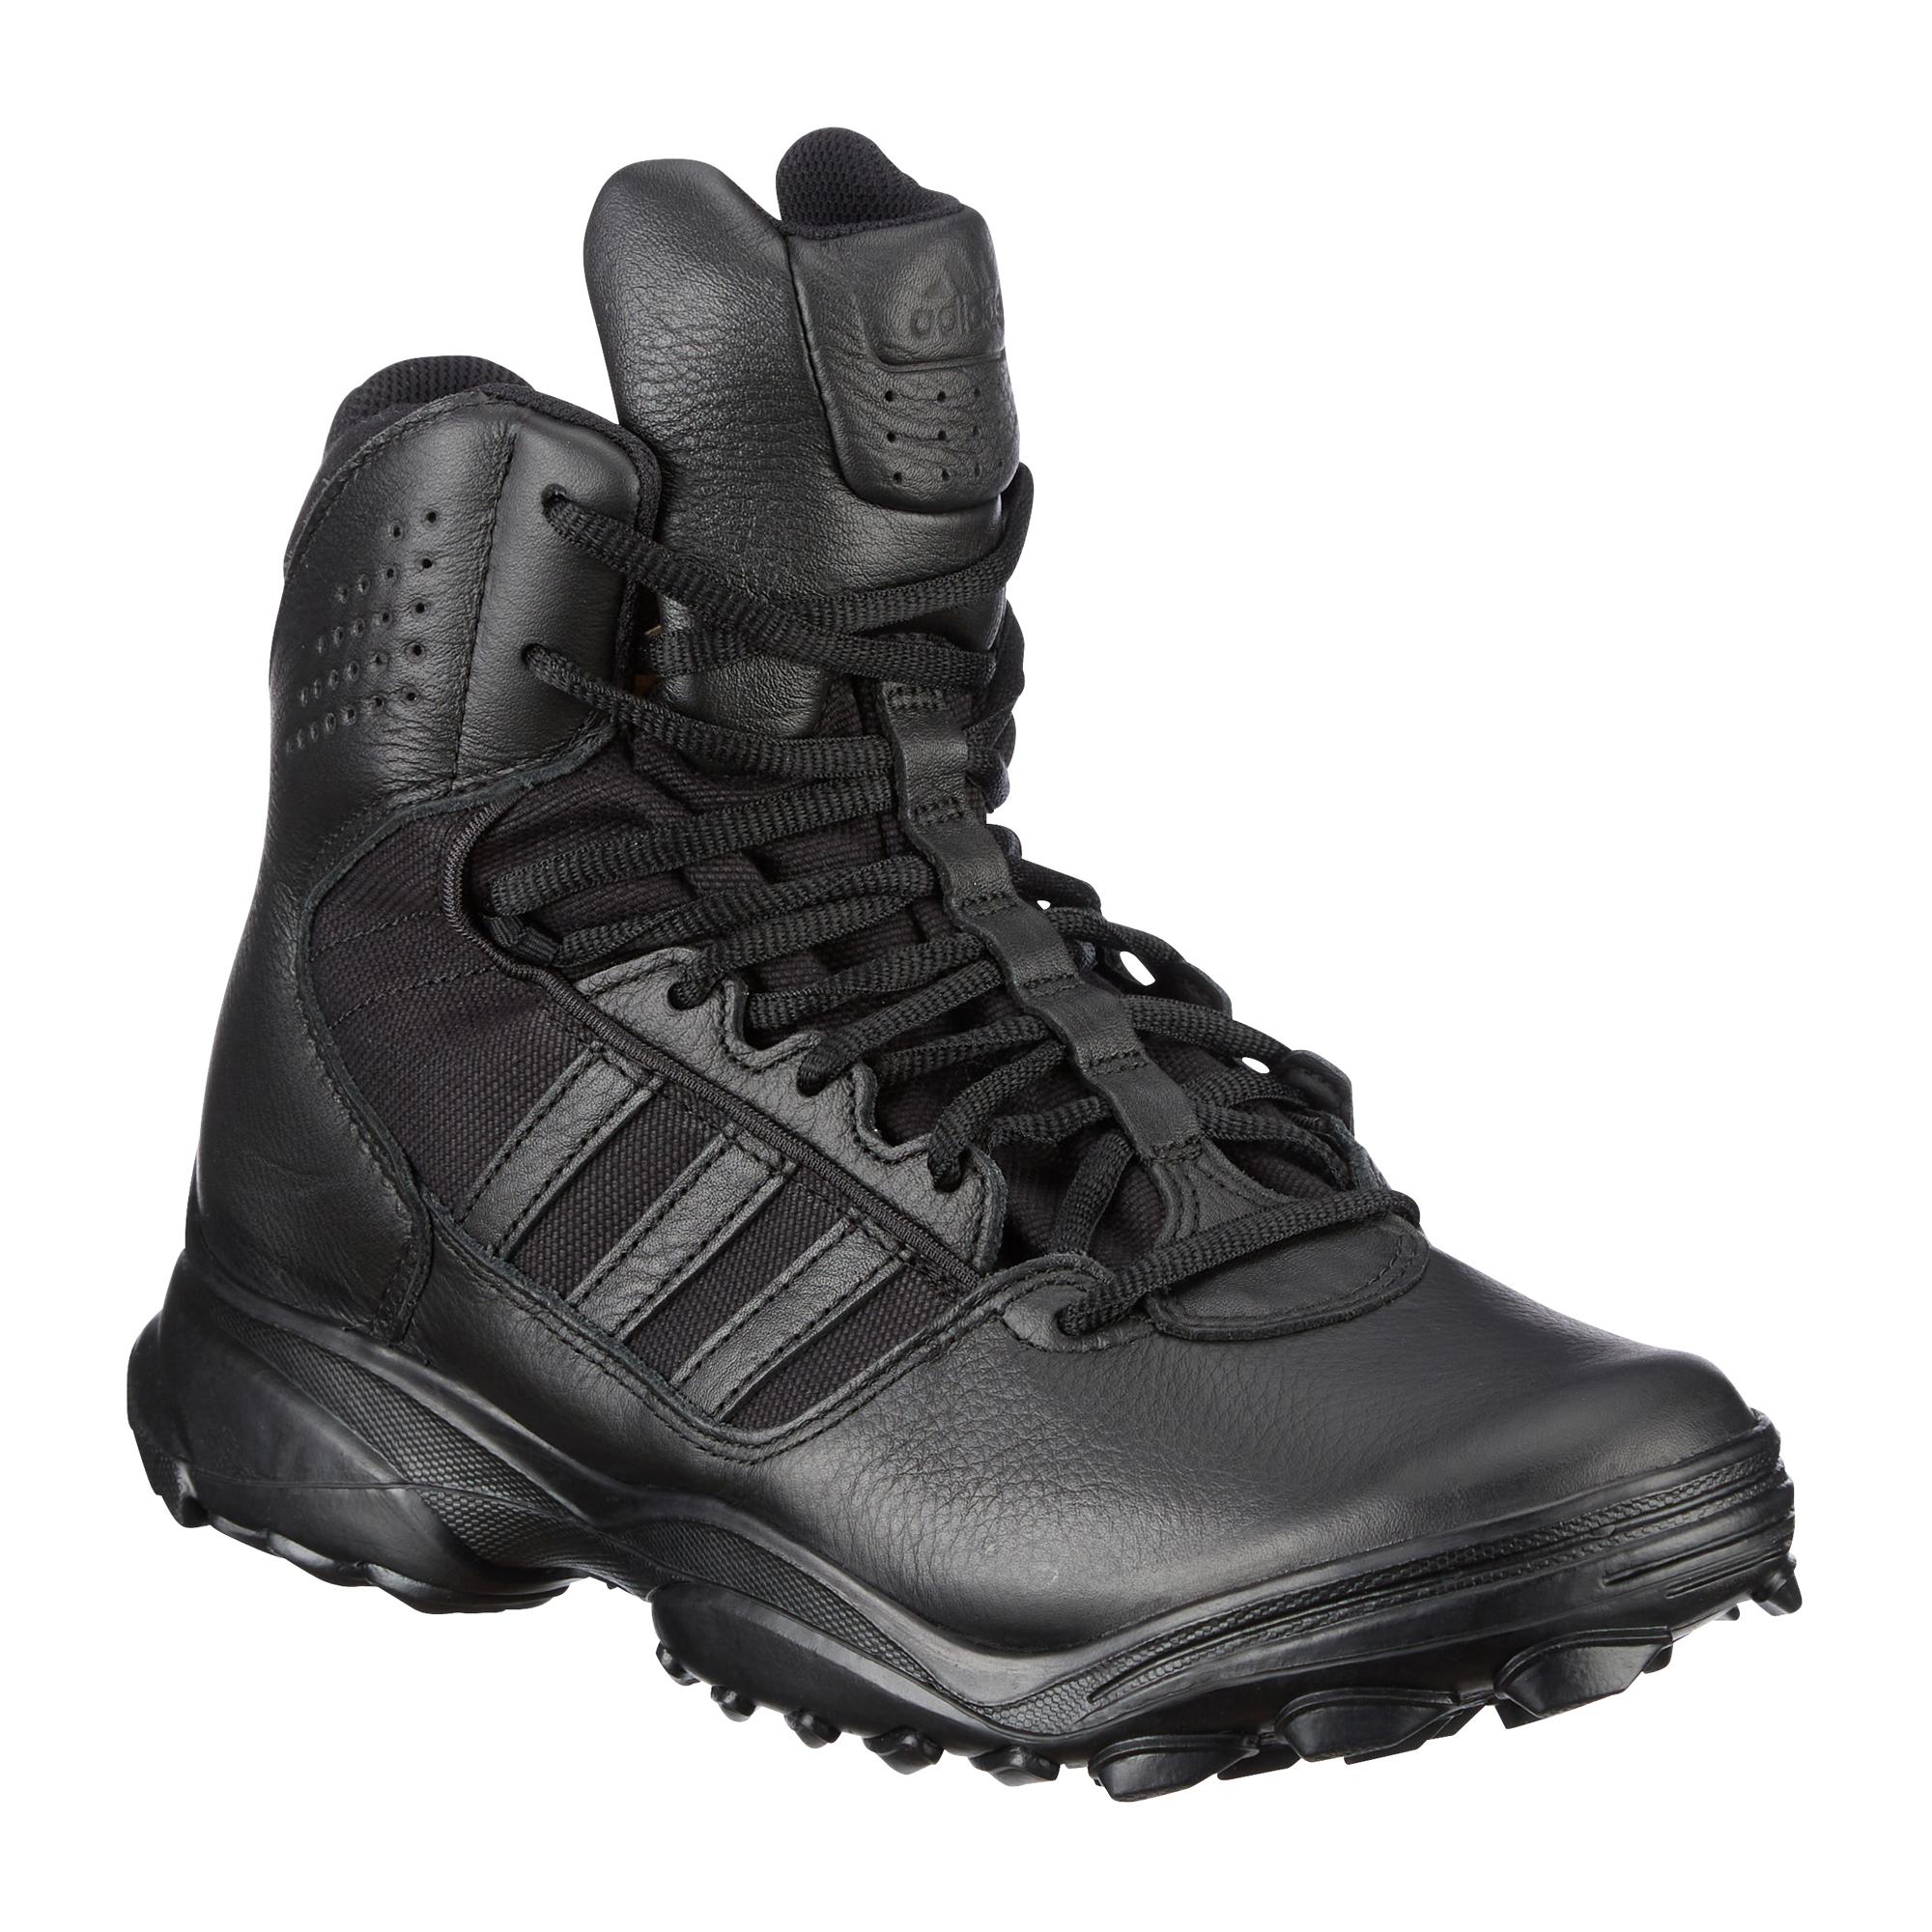 Sostener peine aprobar  Tactical Boot adidas GSG 9.7 | Tactical Boot adidas GSG 9.7 | Combat Boots  | Boots | Footwear | Clothing